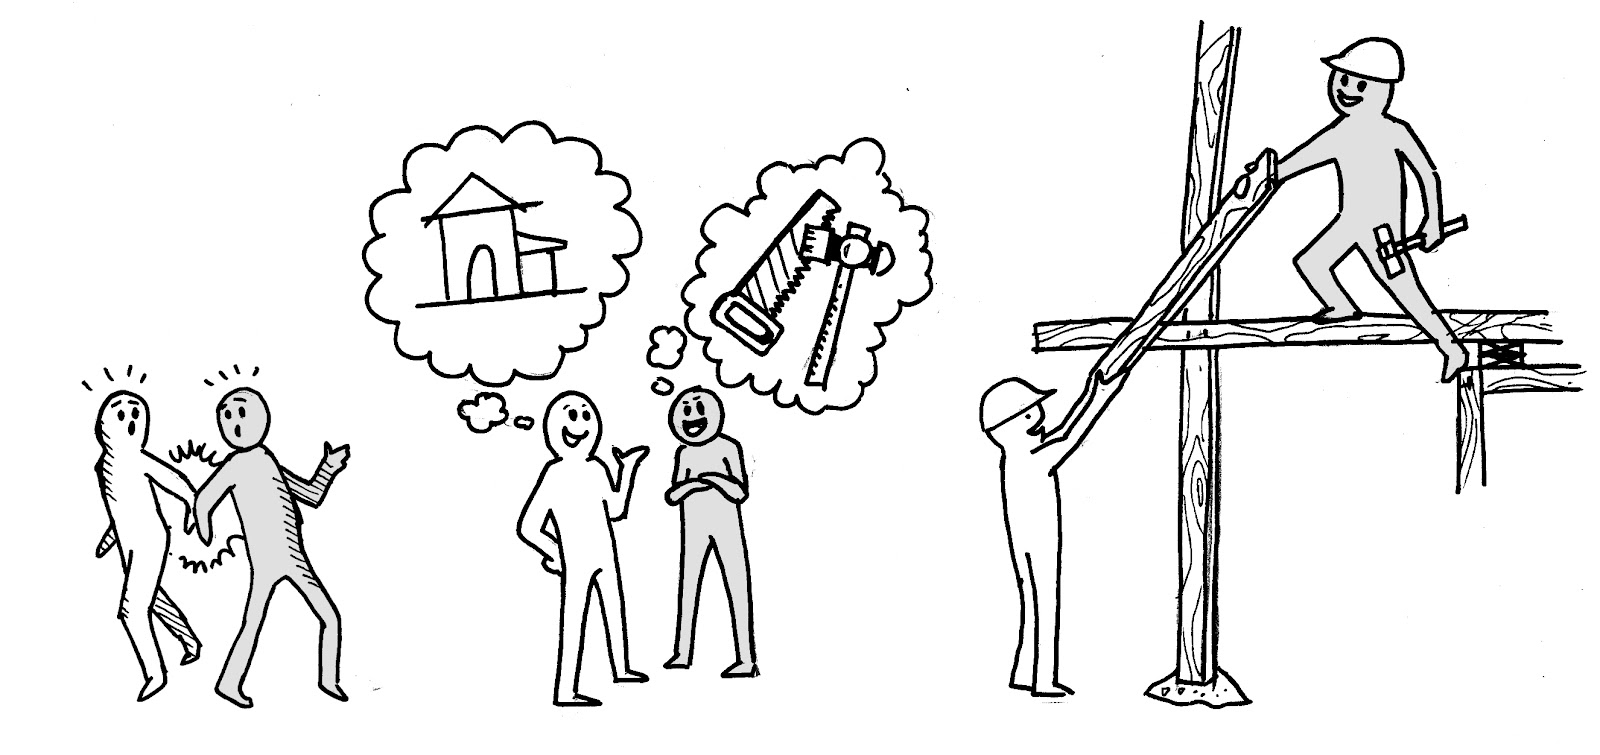 kyle doggett u0026 39 s architecture blog  project progress  community planning diagrams